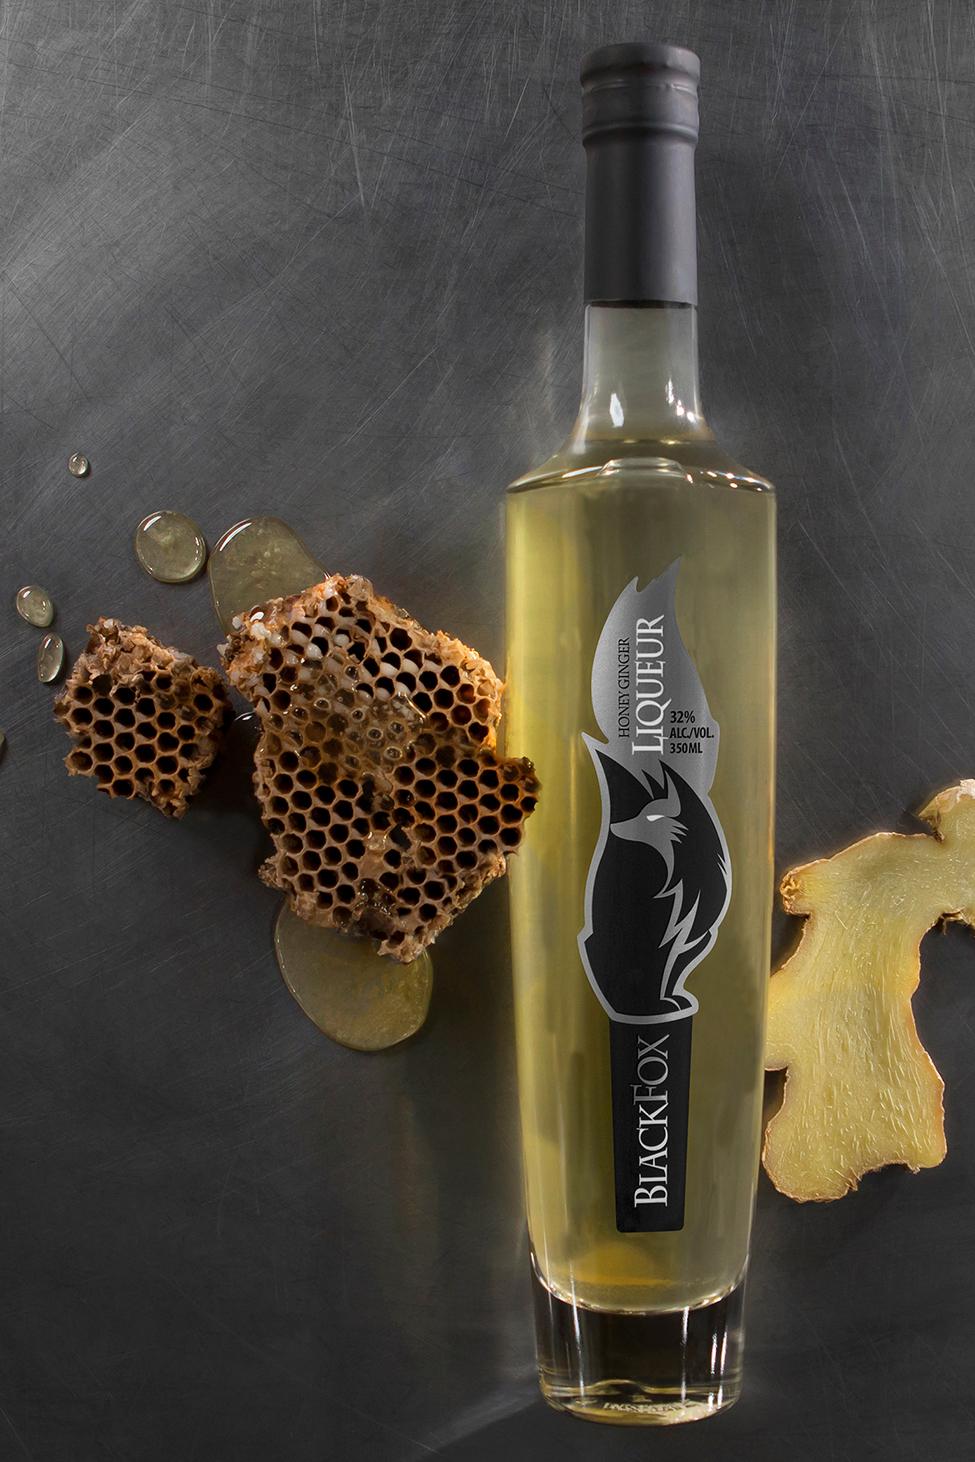 Black Fox Liqueur - High Quality & Fresh